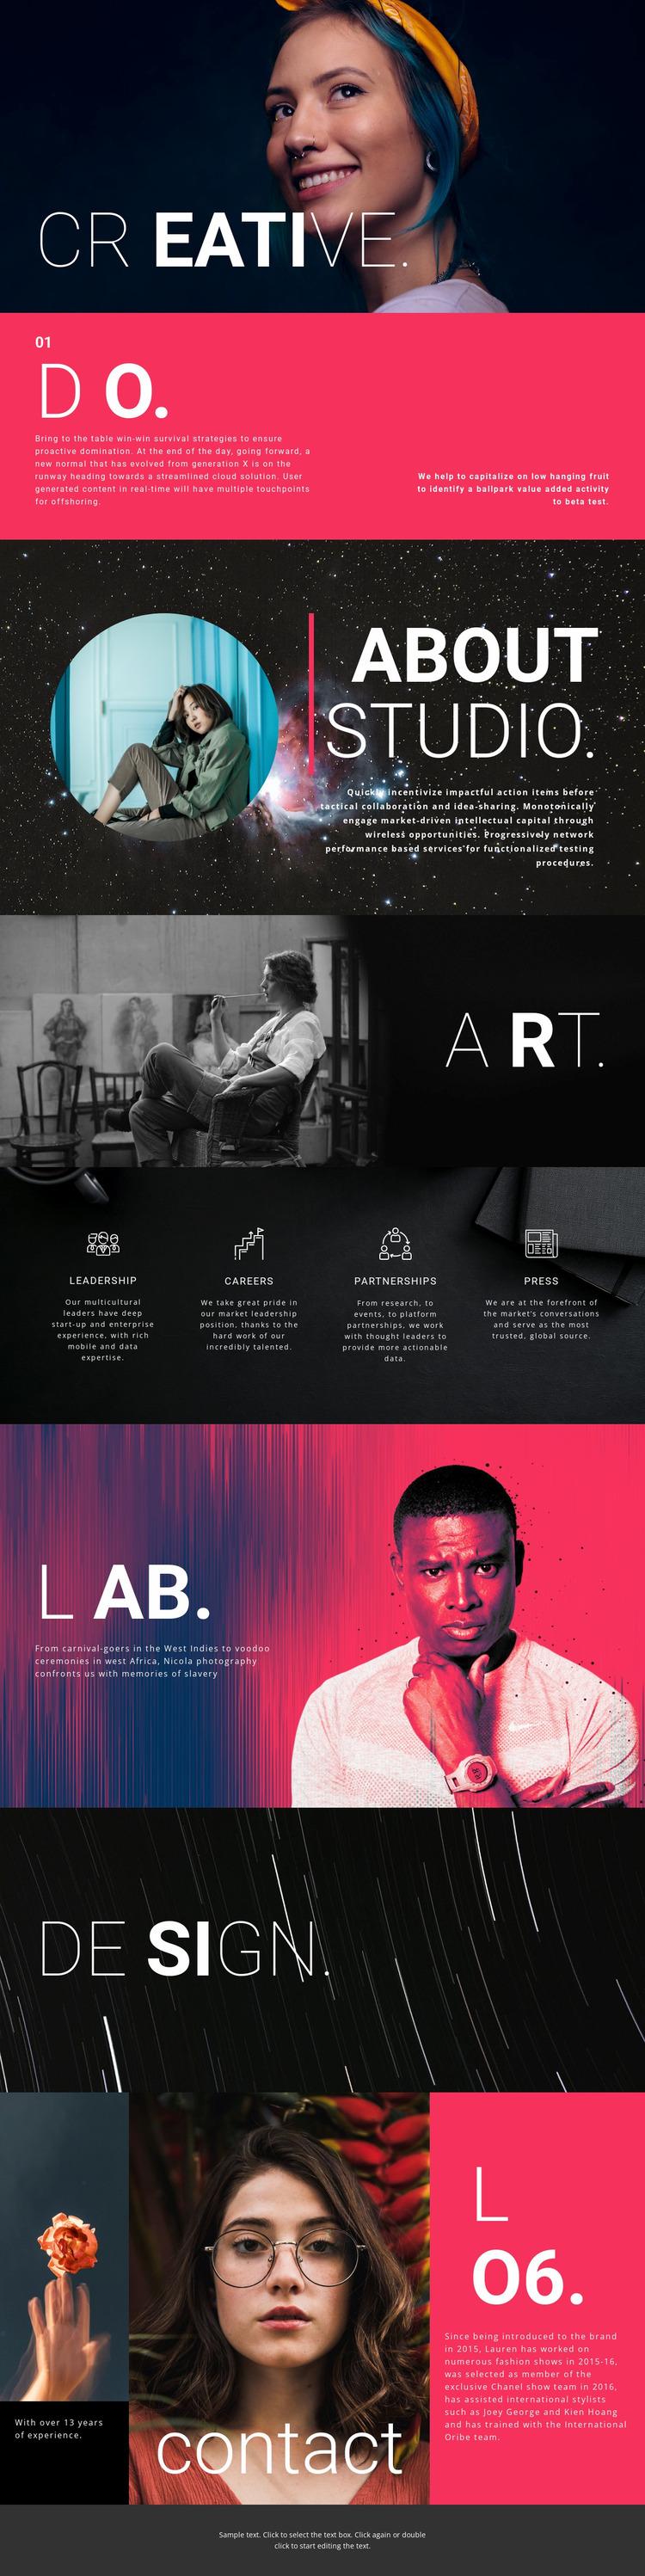 Creative design studio Website Mockup